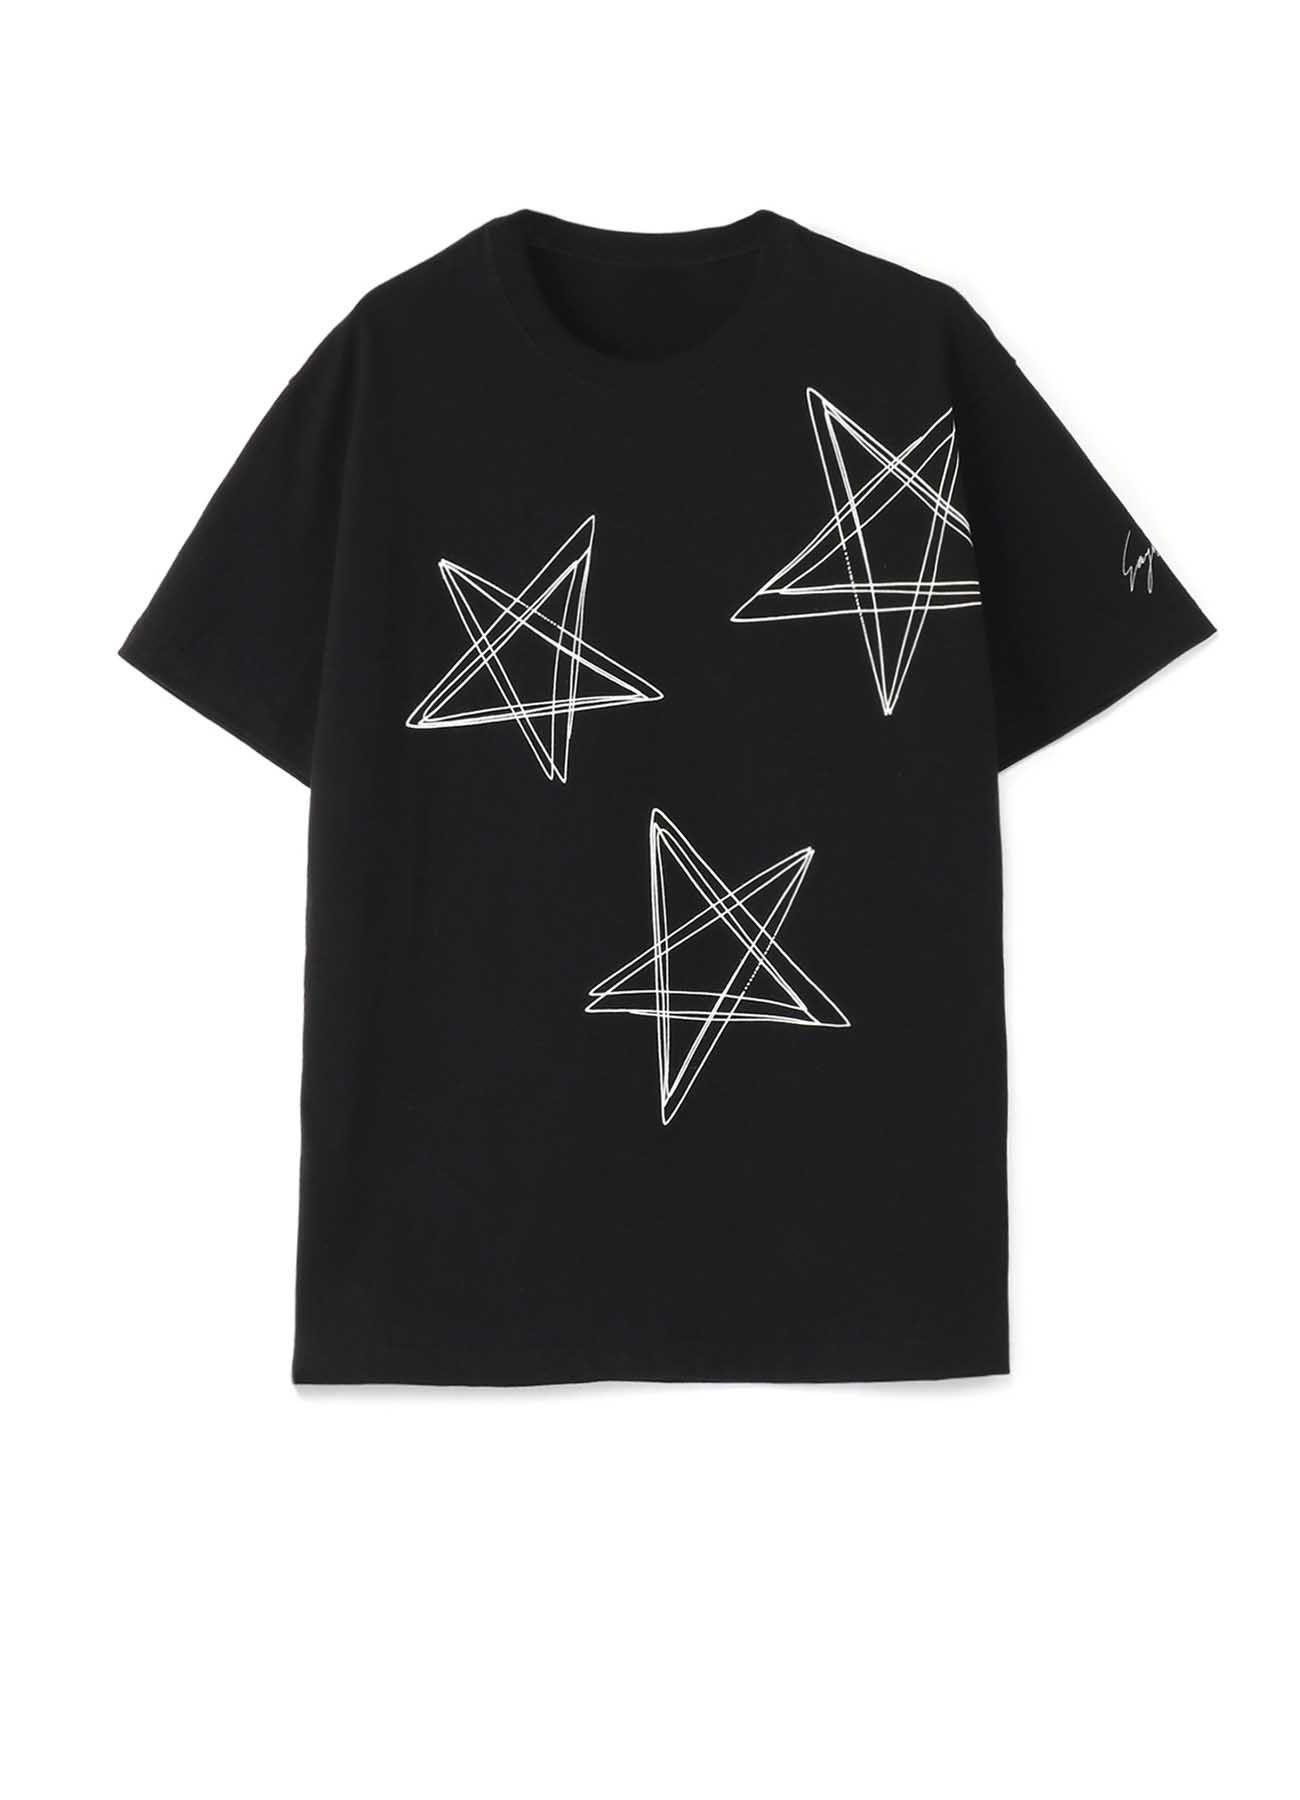 20/CottonJersey Sayaka.Y Triplestar T-shirt